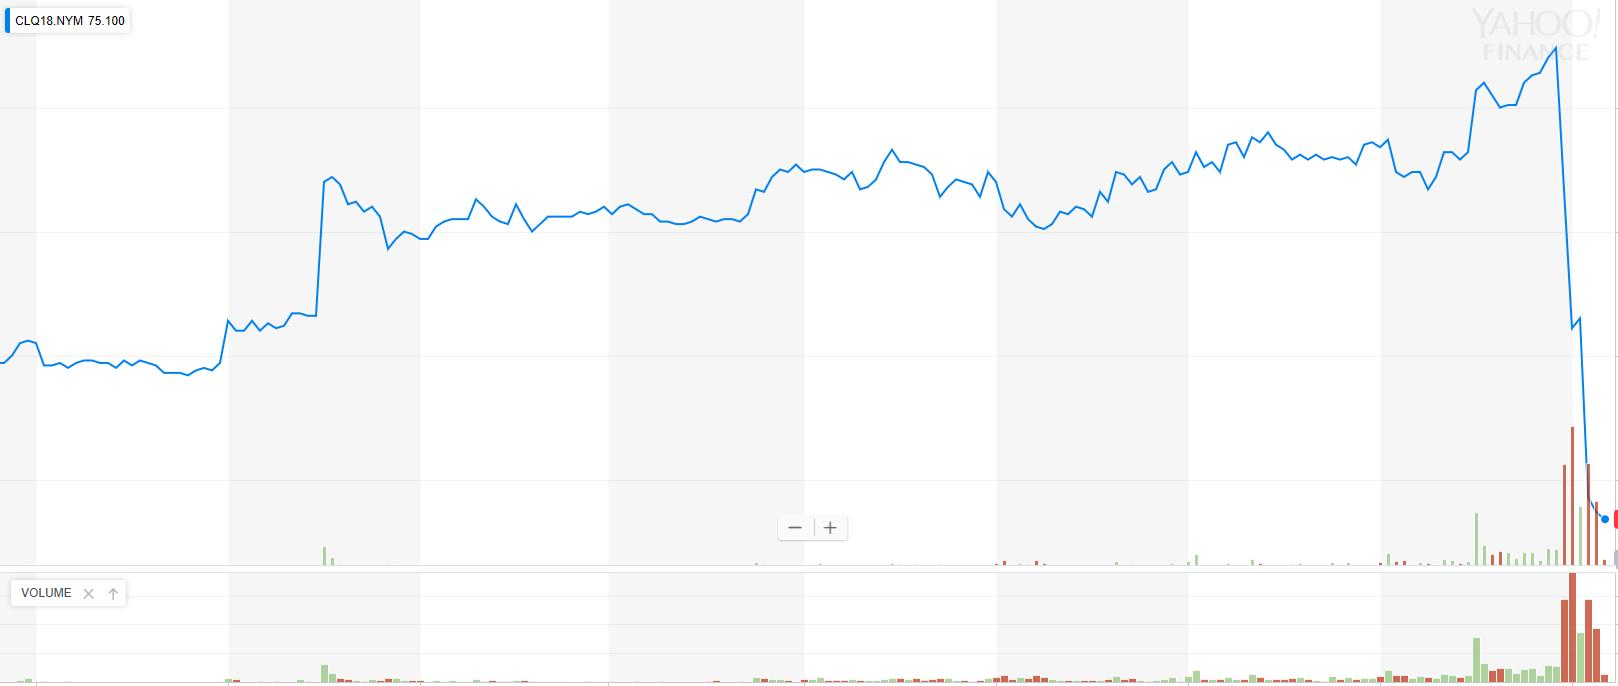 Oil Surpasses the $75 Price Mark